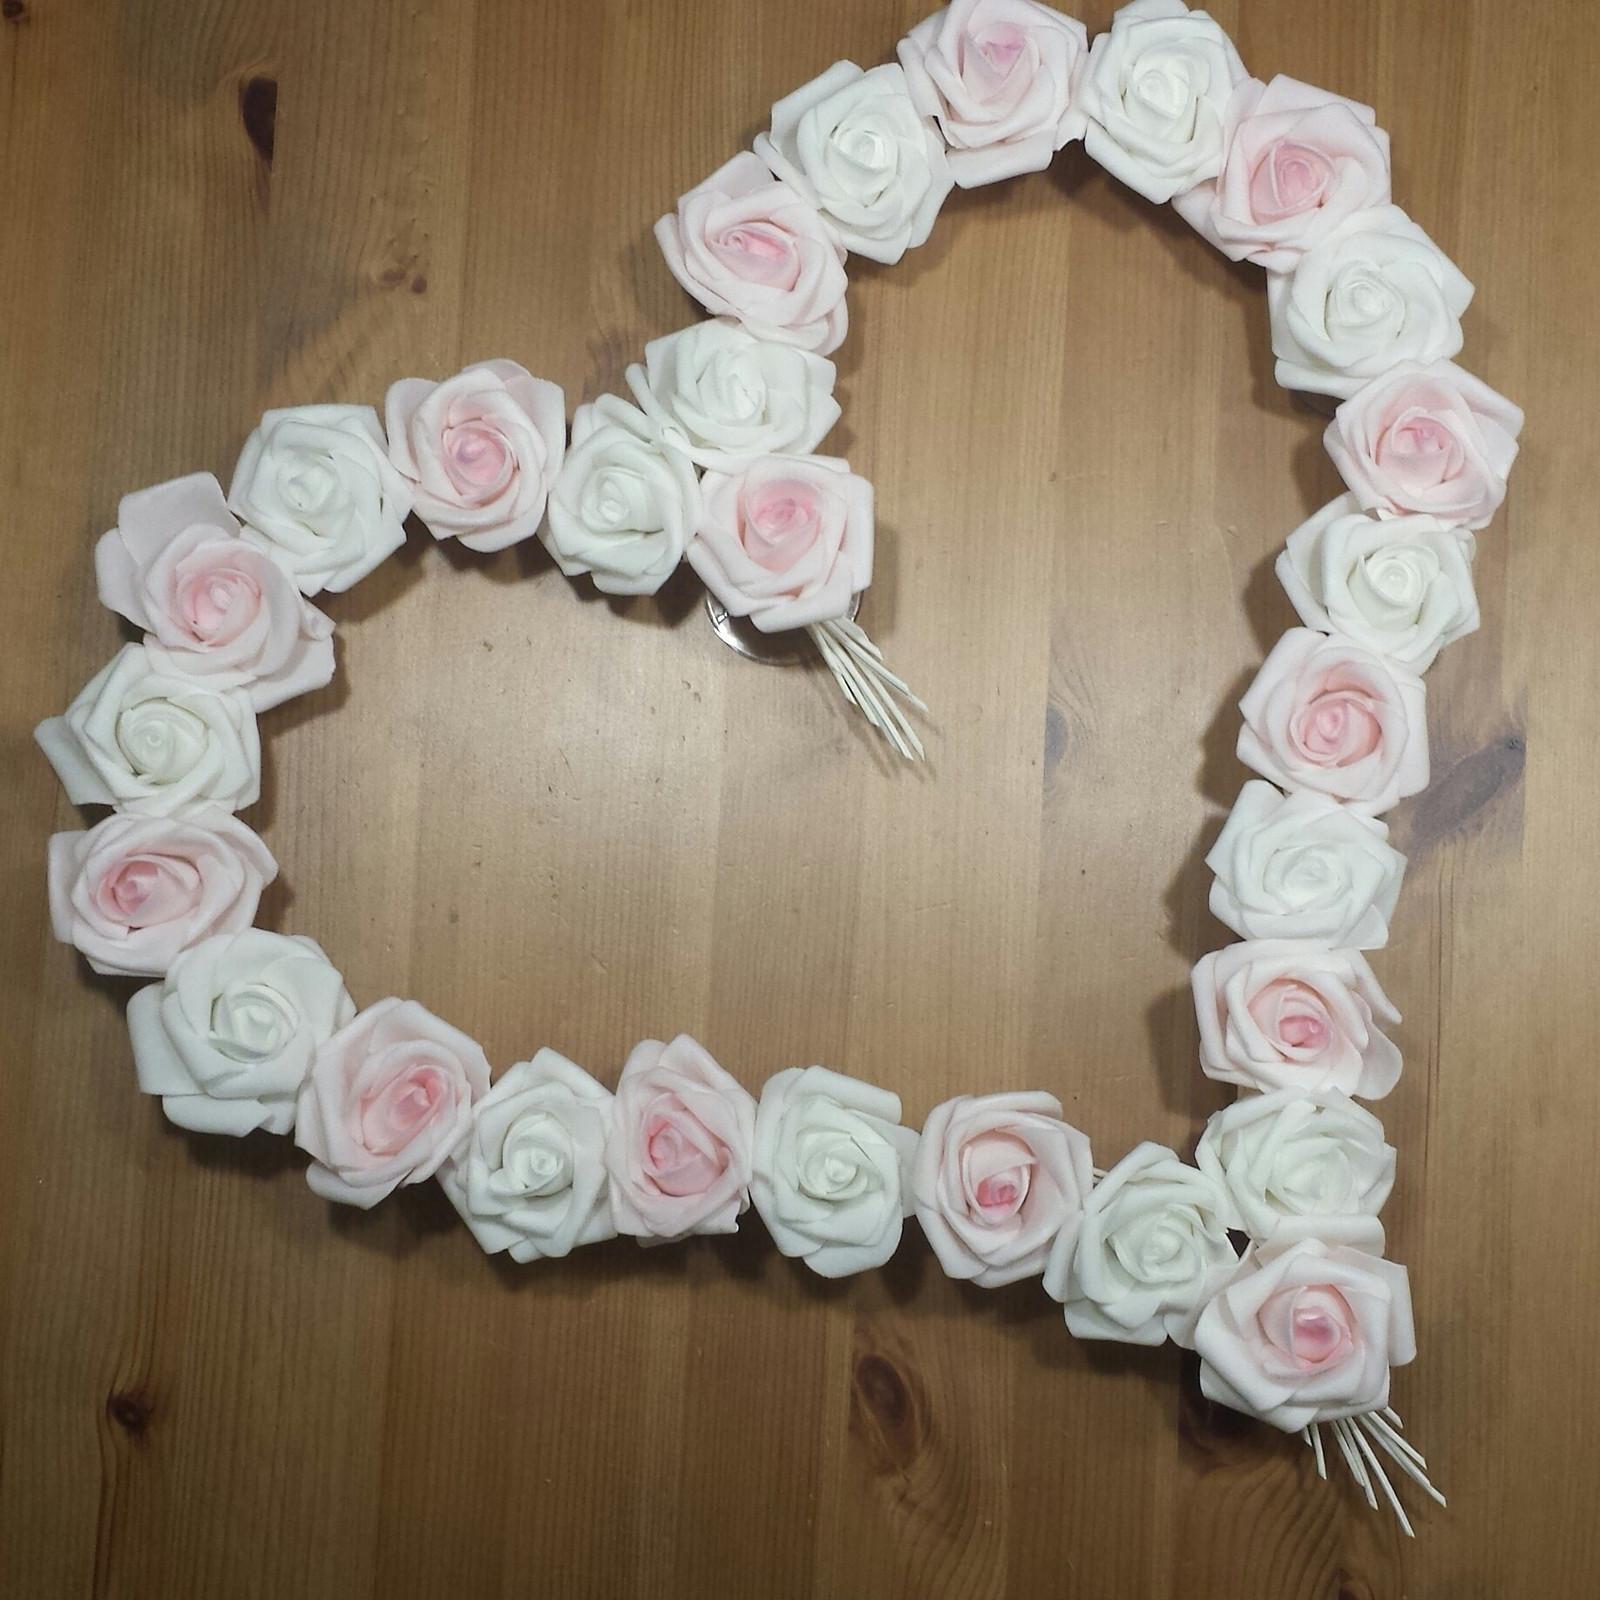 Pedigové srdce na kapotu bílé a růžové SKLADEM - Obrázek č. 1